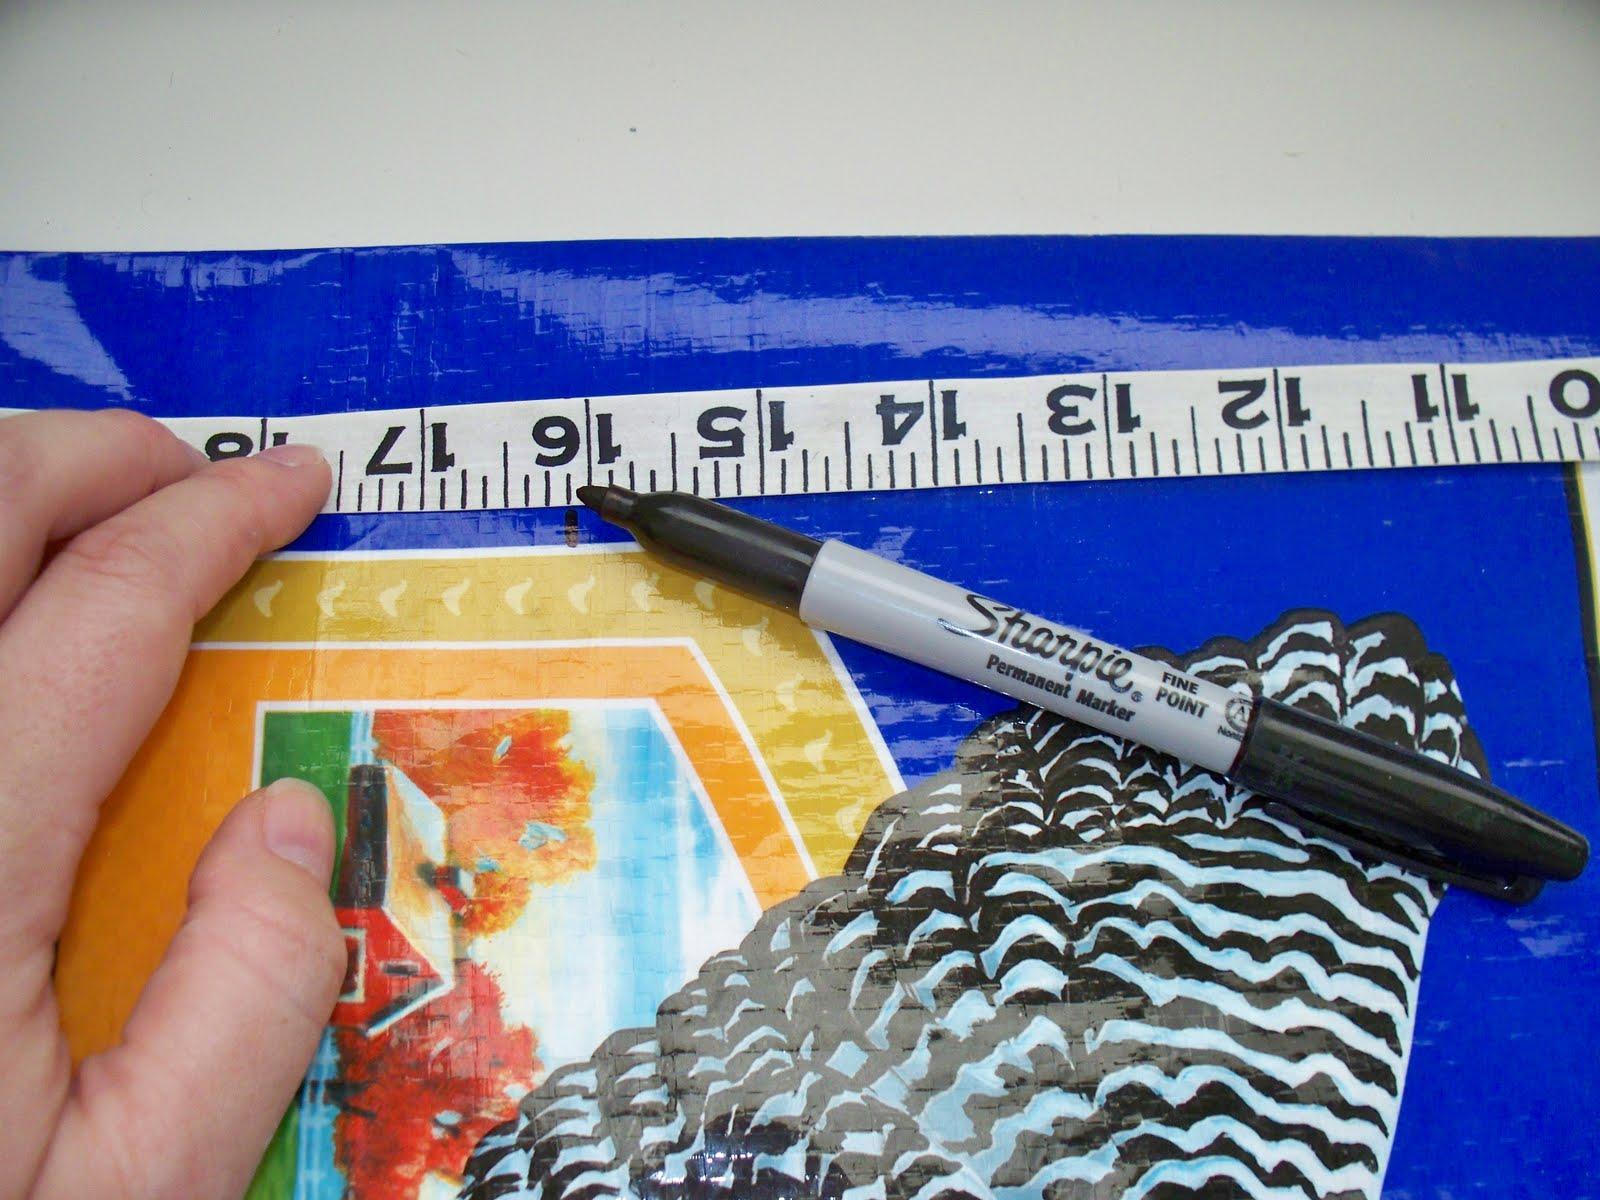 Meter+stick+vs.+yardstick